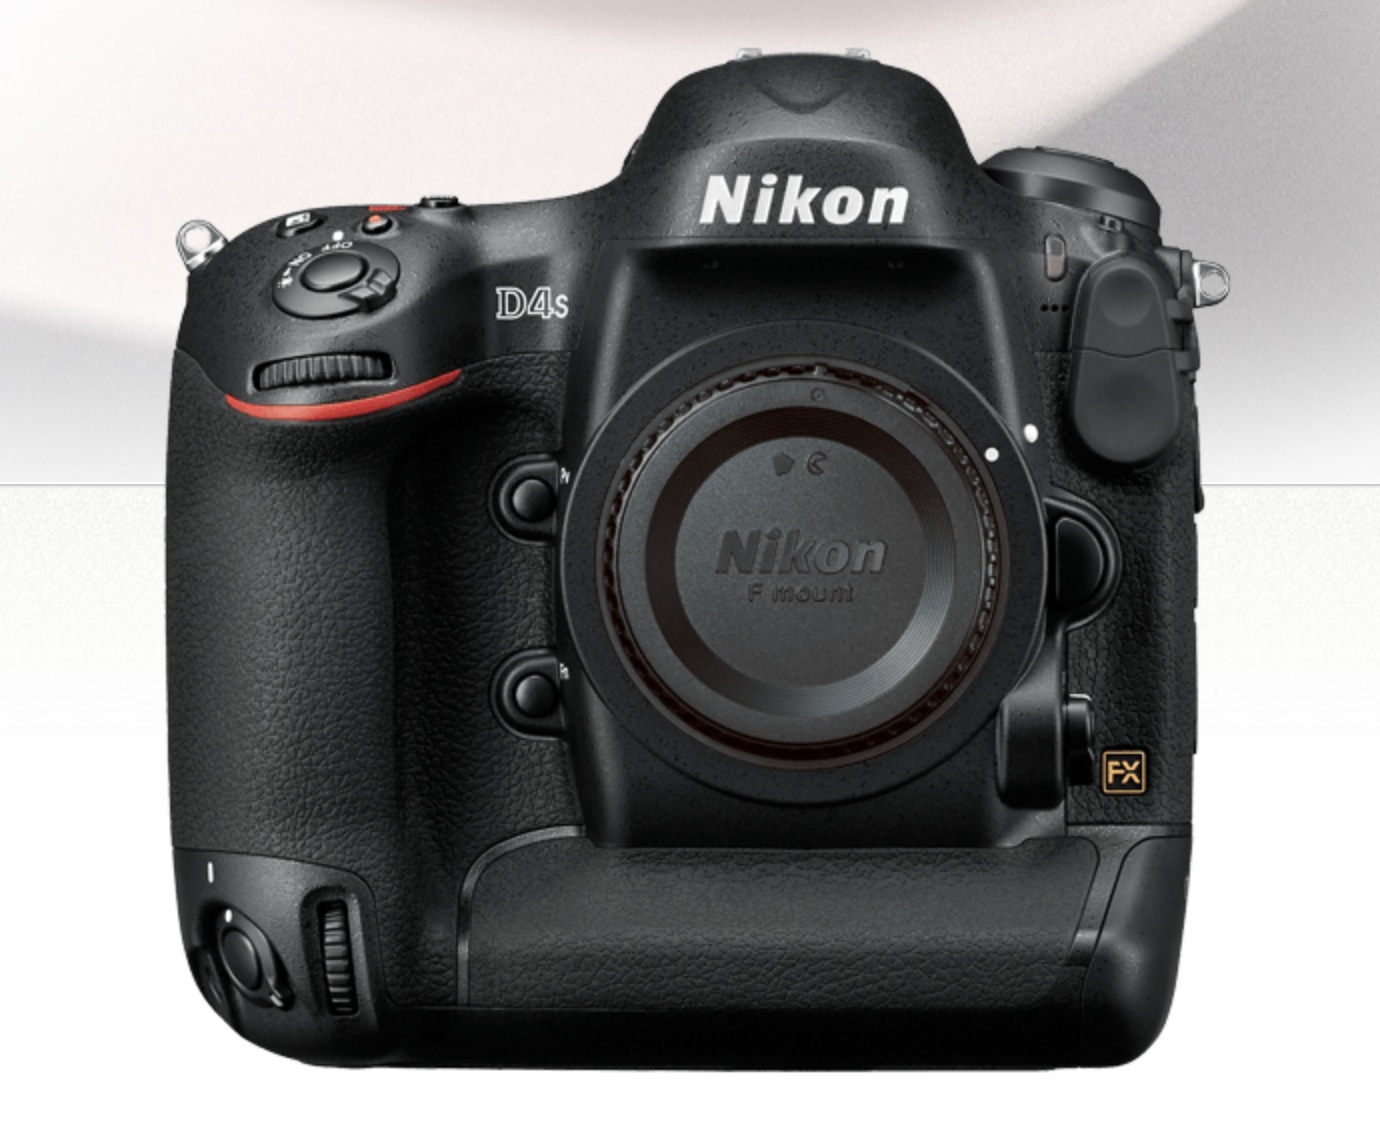 http://thedigitalstory.com/2014/05/23/nikon-4s-front.jpg